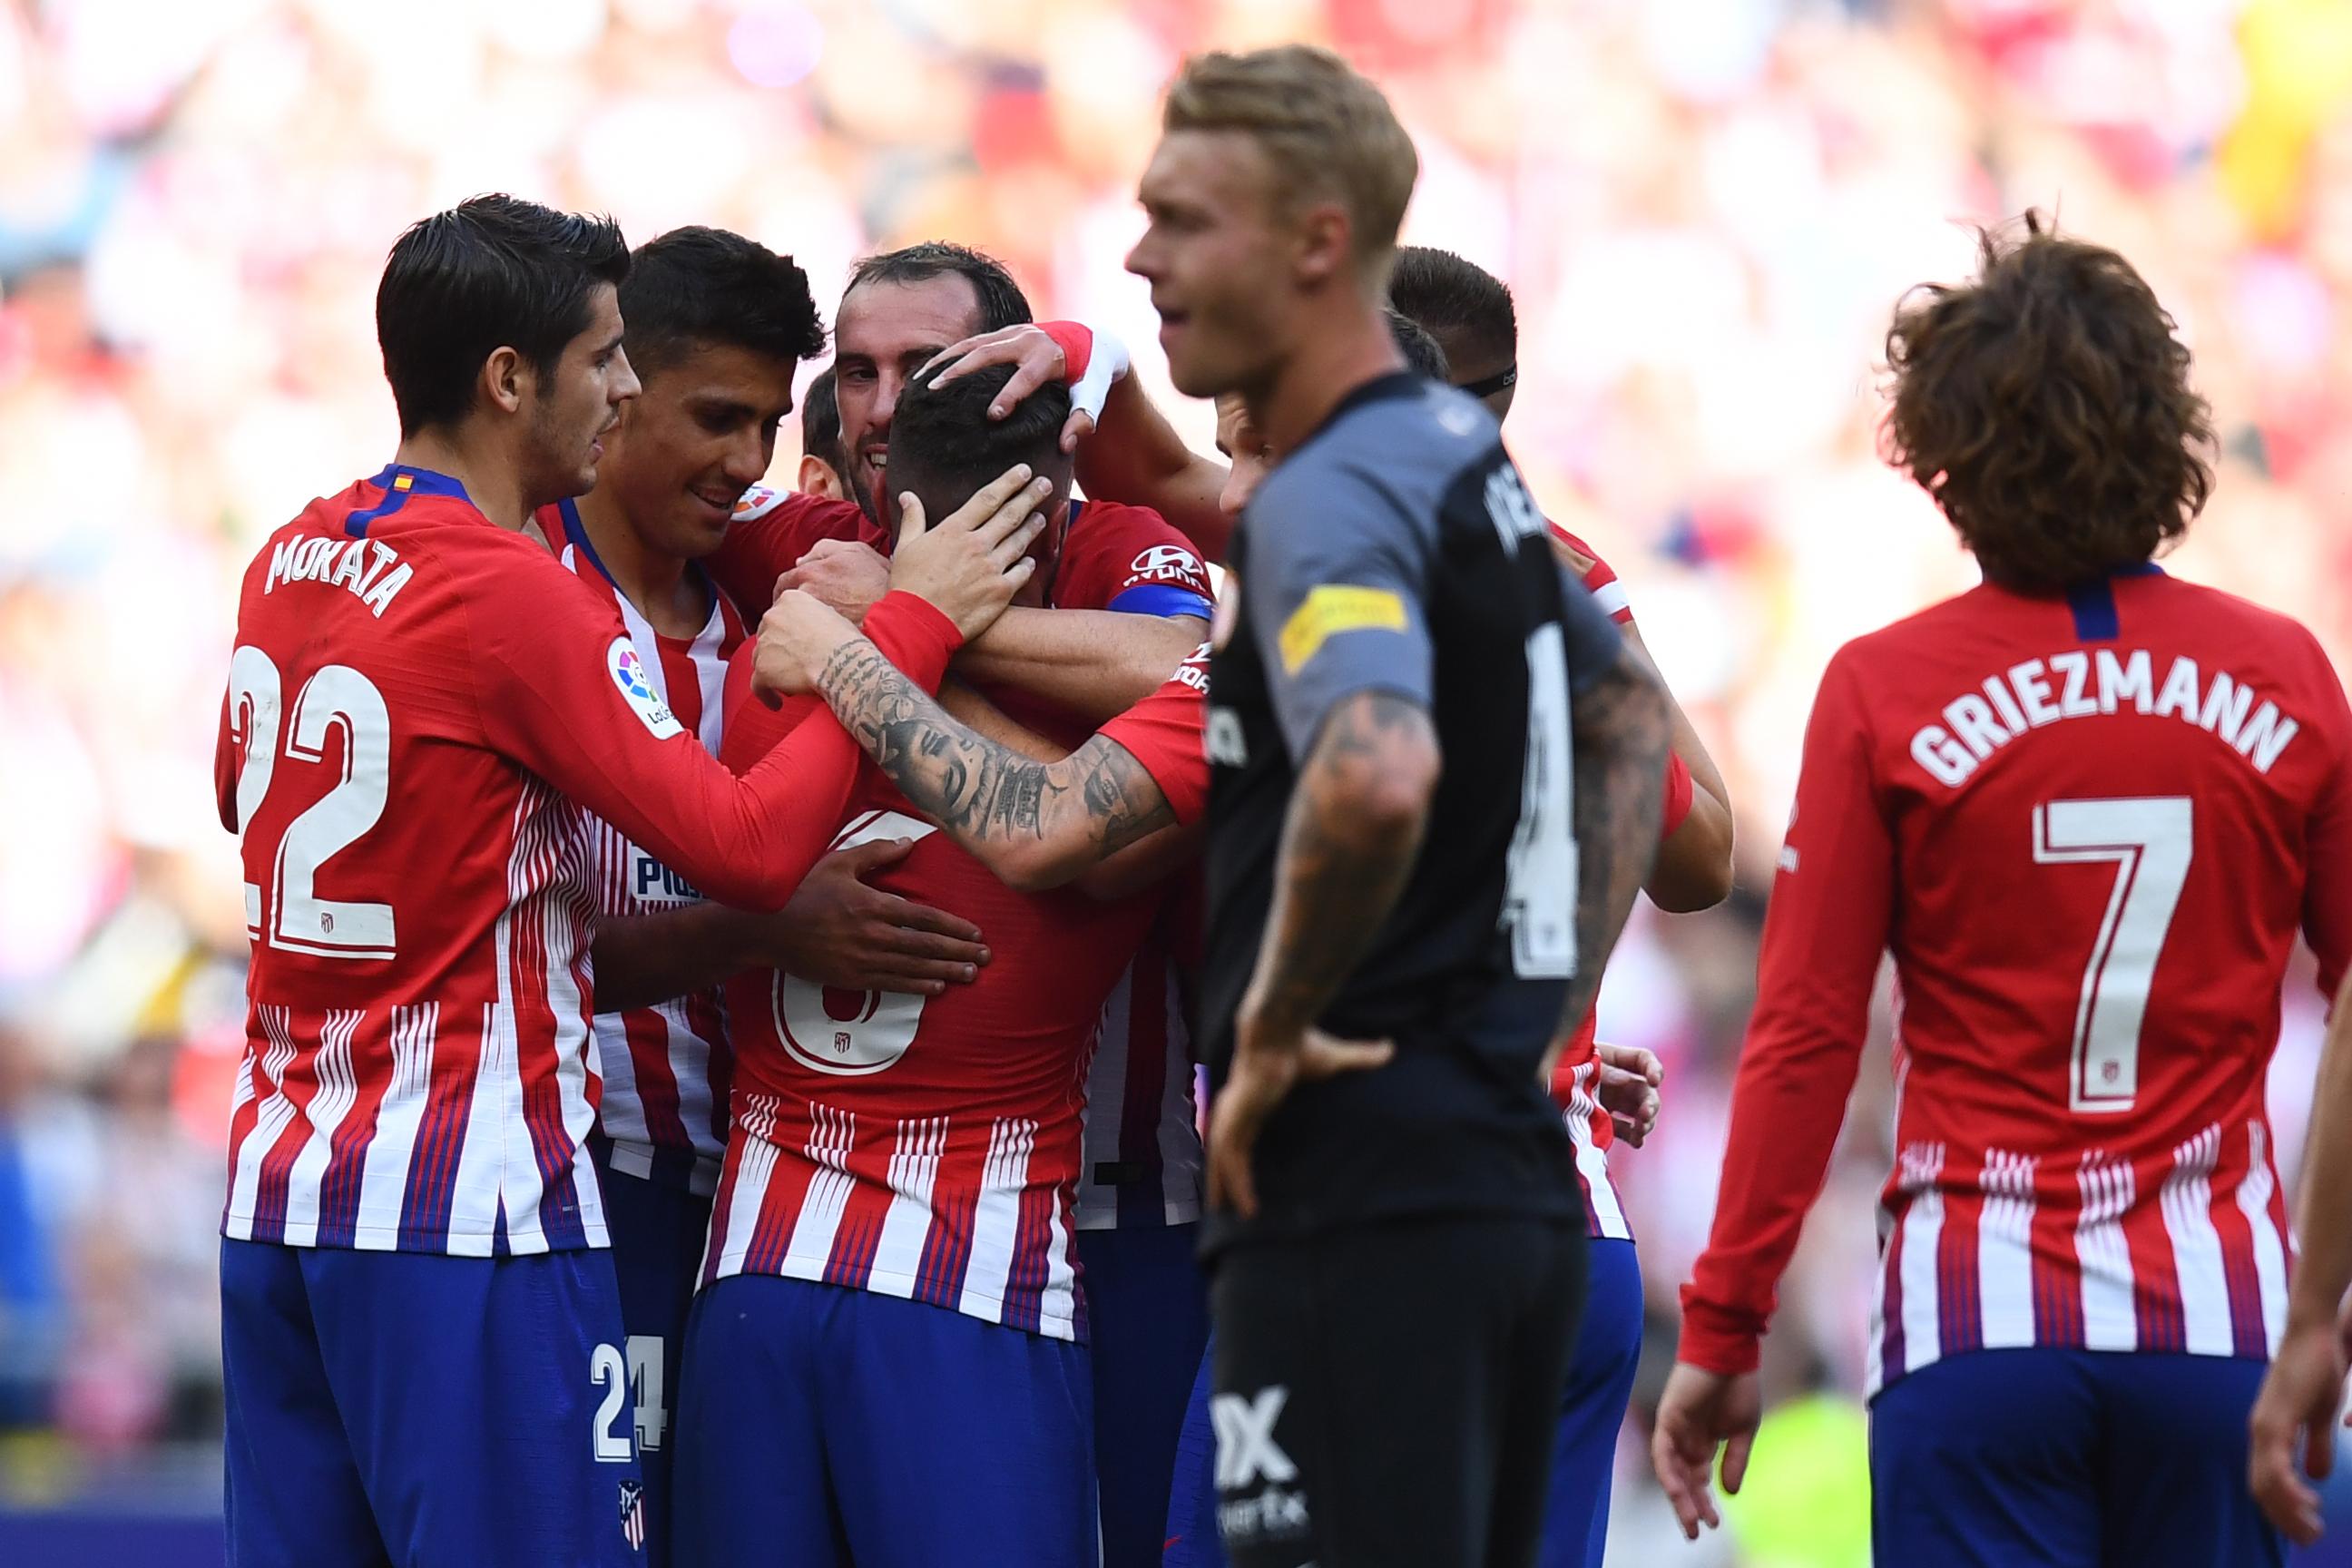 Atlético de Madrid vendrá a jugar a México